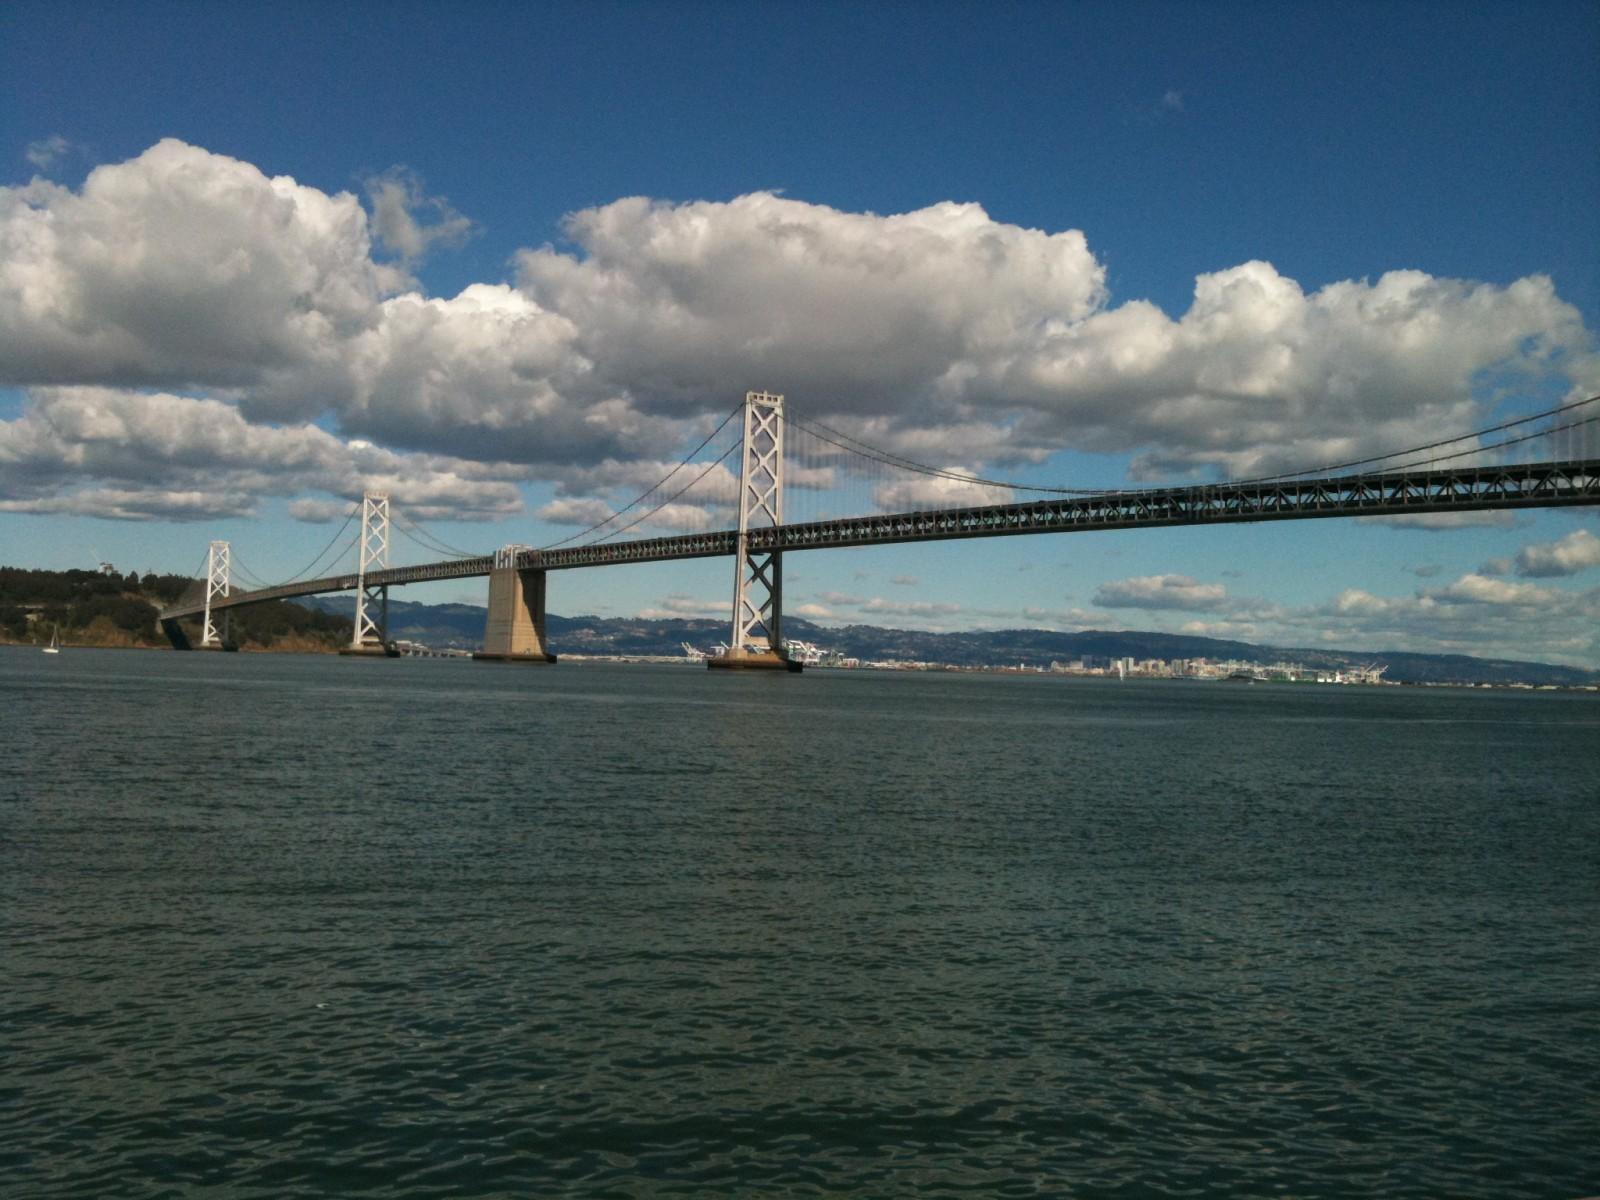 iPhone 3GS Bay Bridge tutto